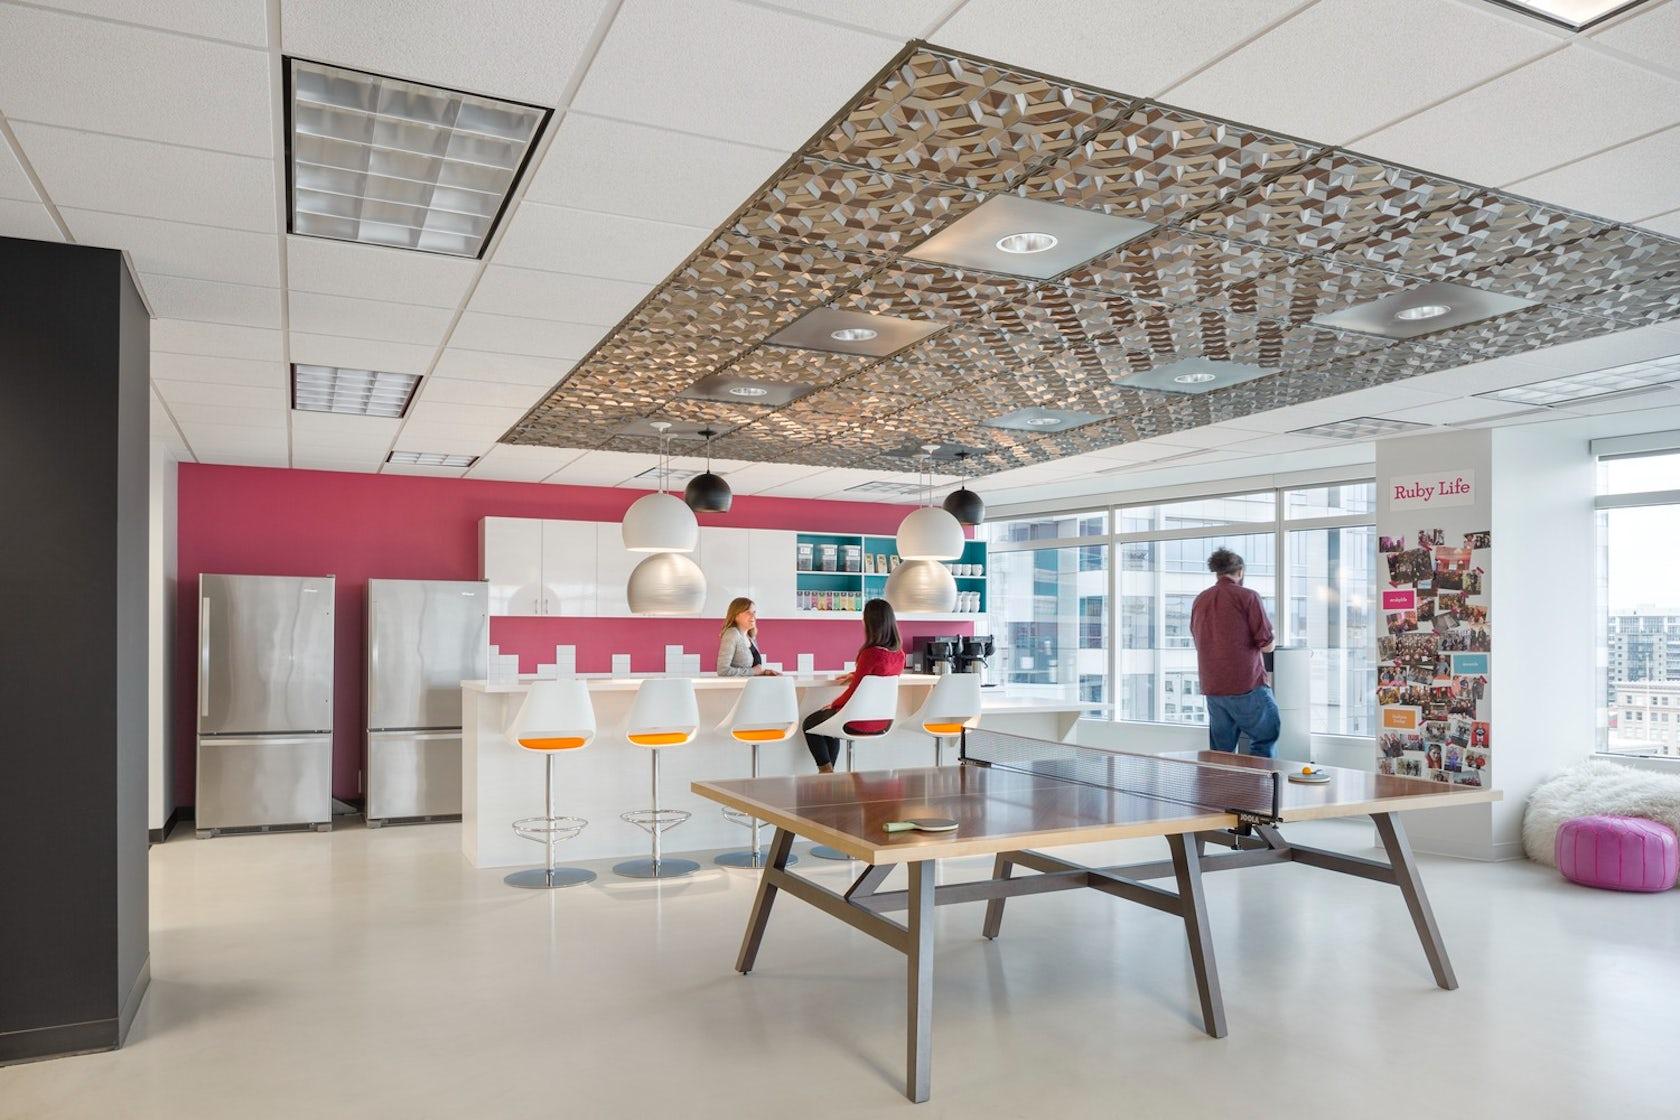 Ruby Receptionists Architizer